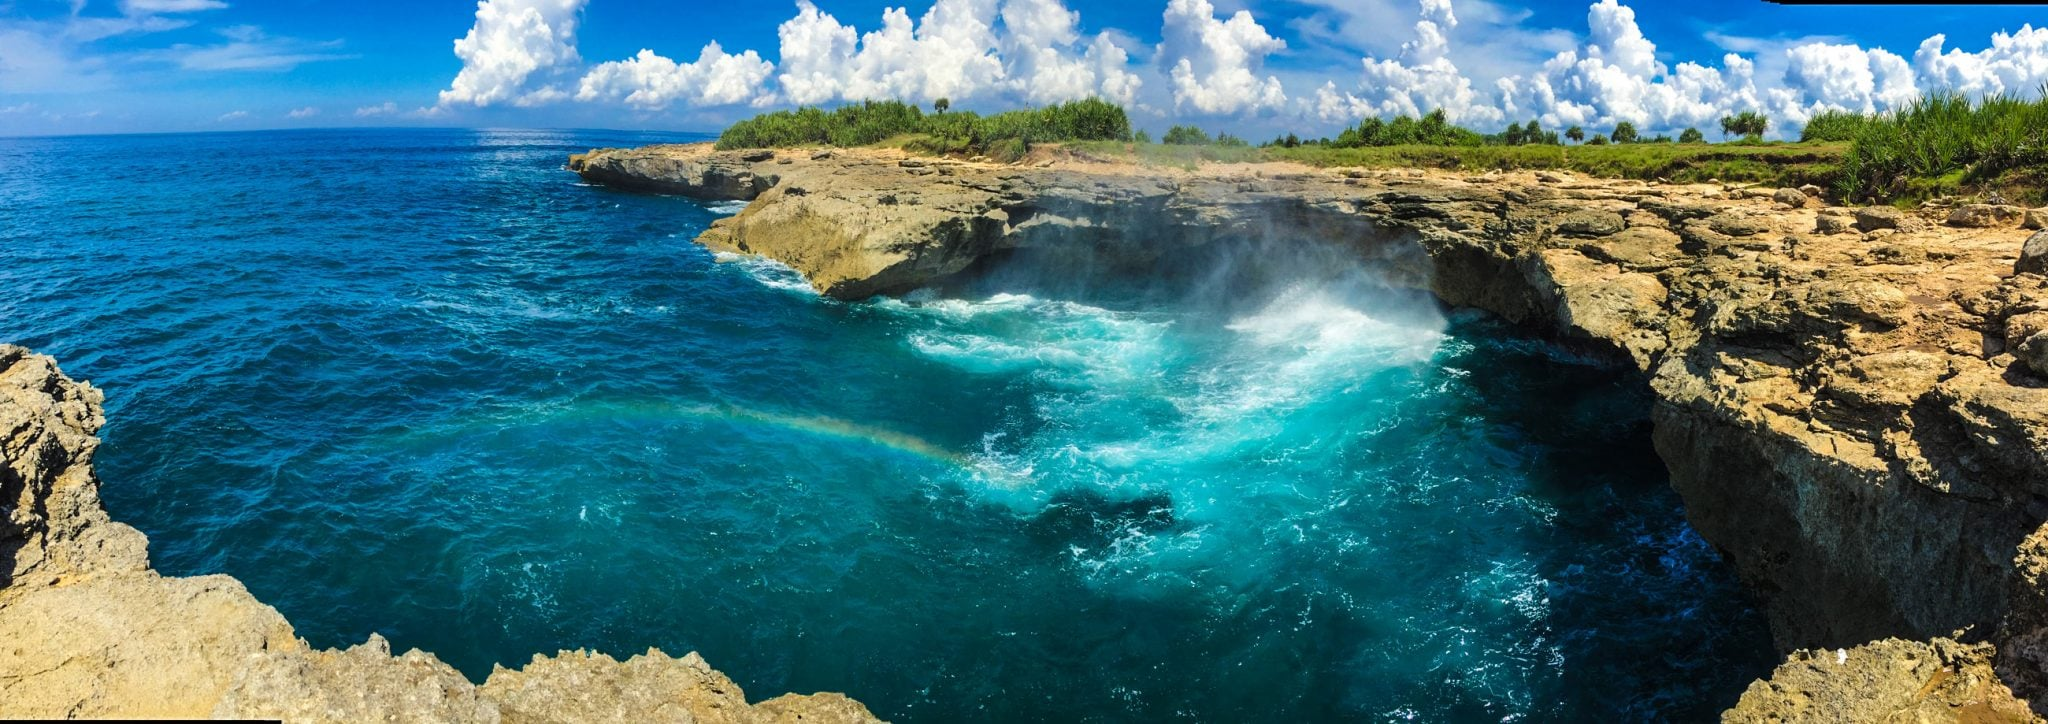 Nusa Lembongan Devils Tear